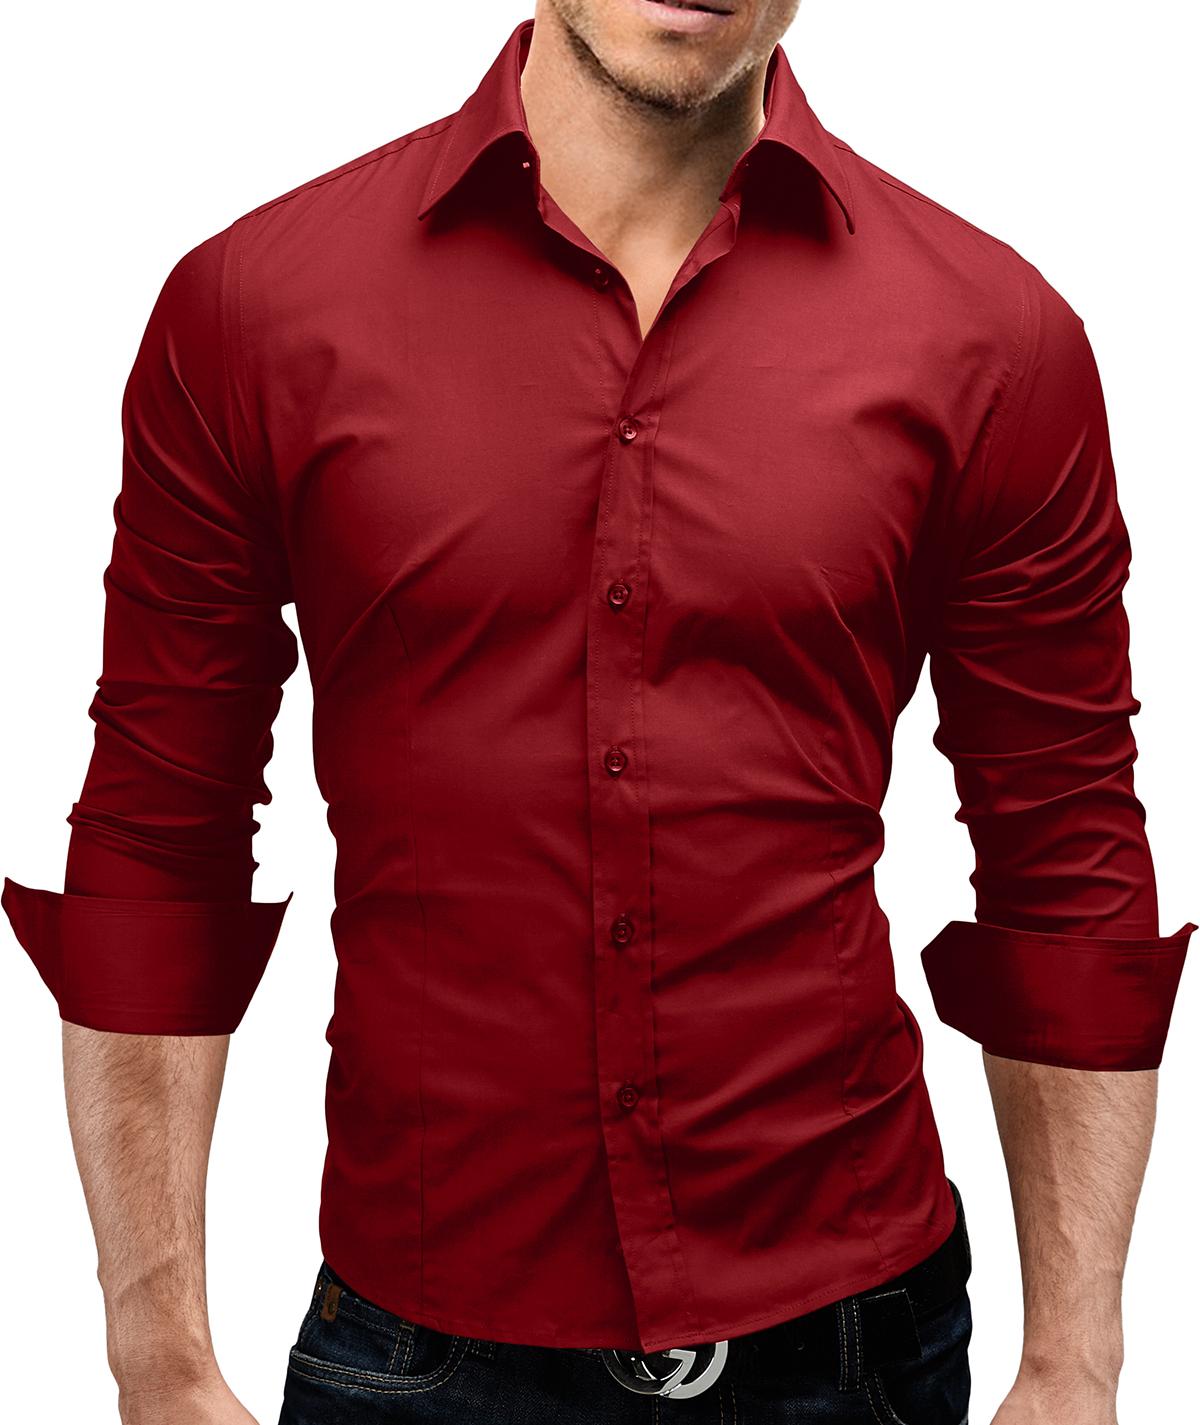 details about merish herren hemd 6 modelle s xxl slim fit neu t shirt. Black Bedroom Furniture Sets. Home Design Ideas